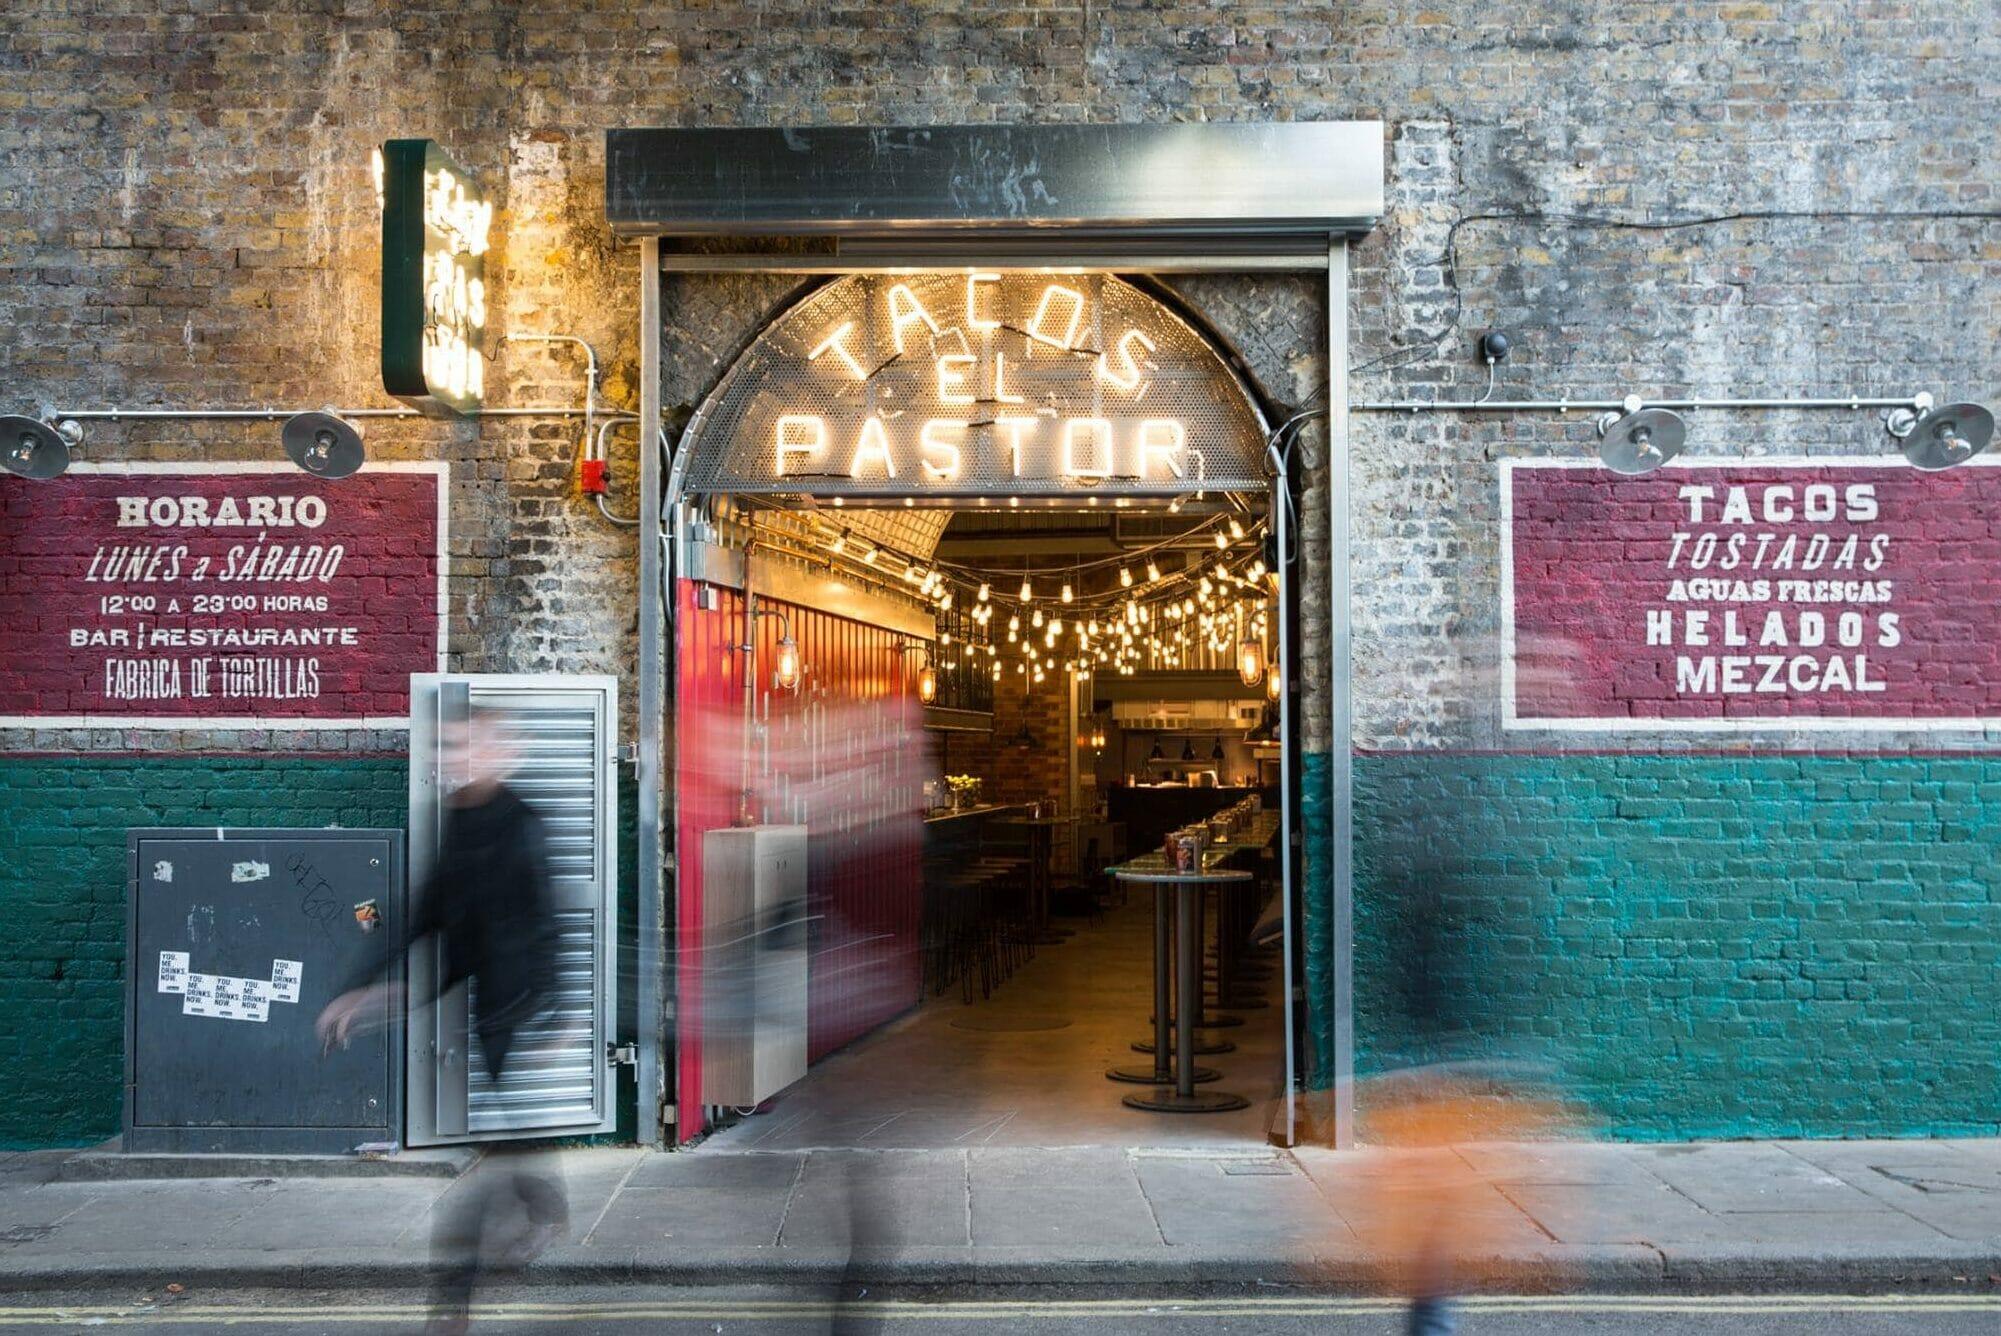 el pastor london bridge restaurant